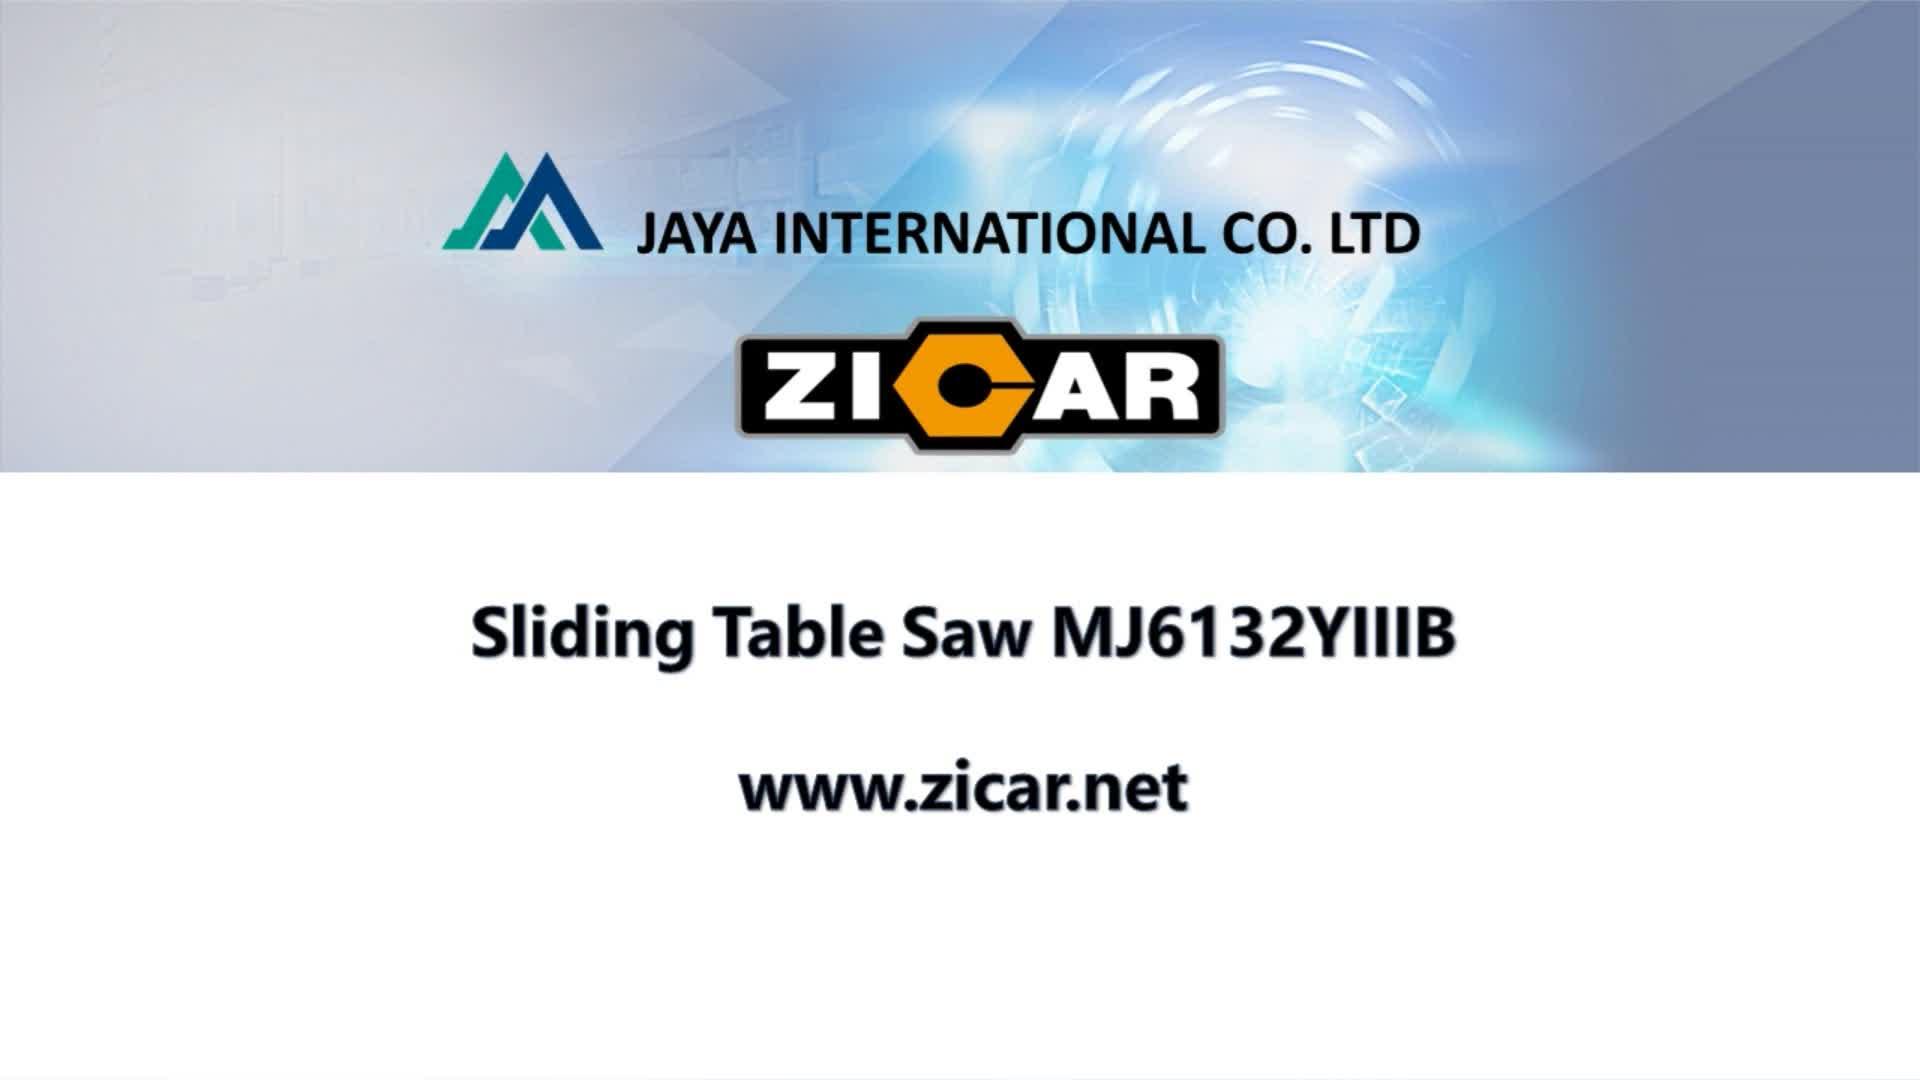 ZICAR MJ6132YIIIB Best sale 목 공용 슬라이딩 표 saw